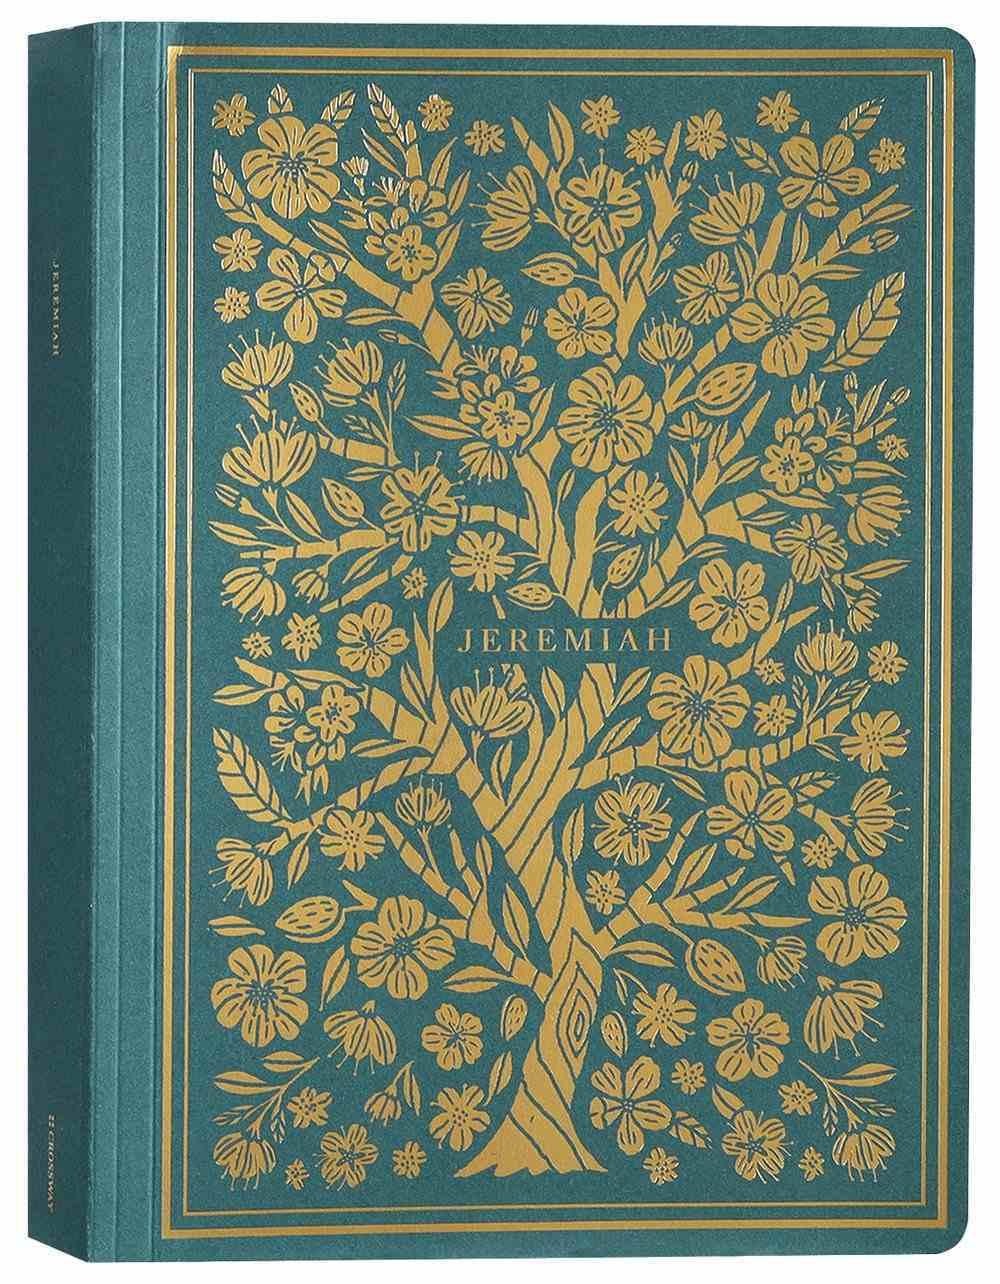 ESV Illuminated Scripture Journal Jeremiah (Black Letter Edition) Paperback